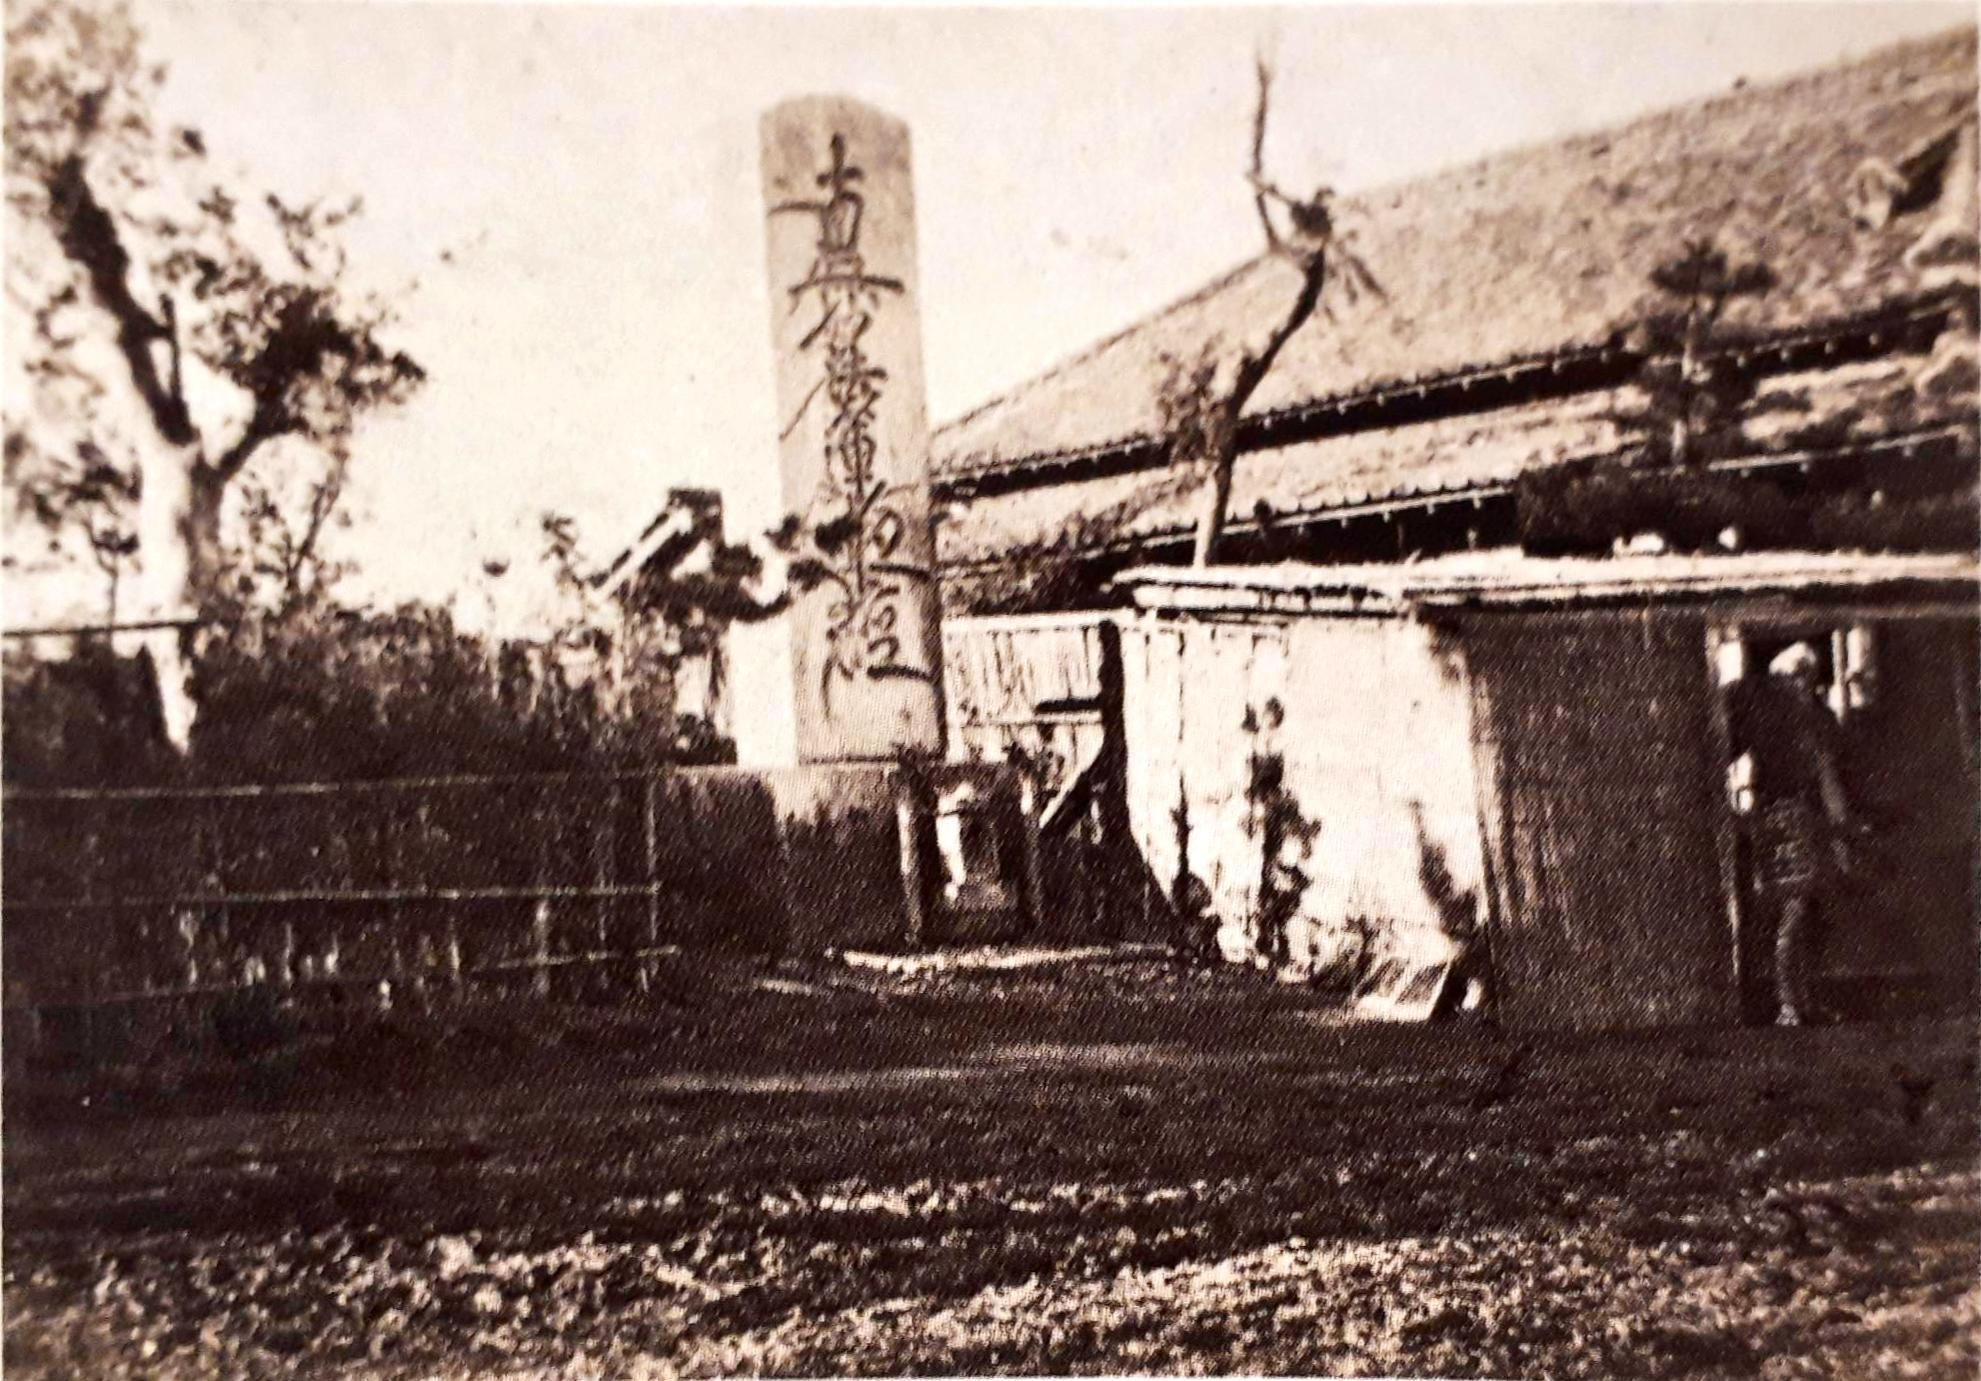 daikyoji temple in suzugamori